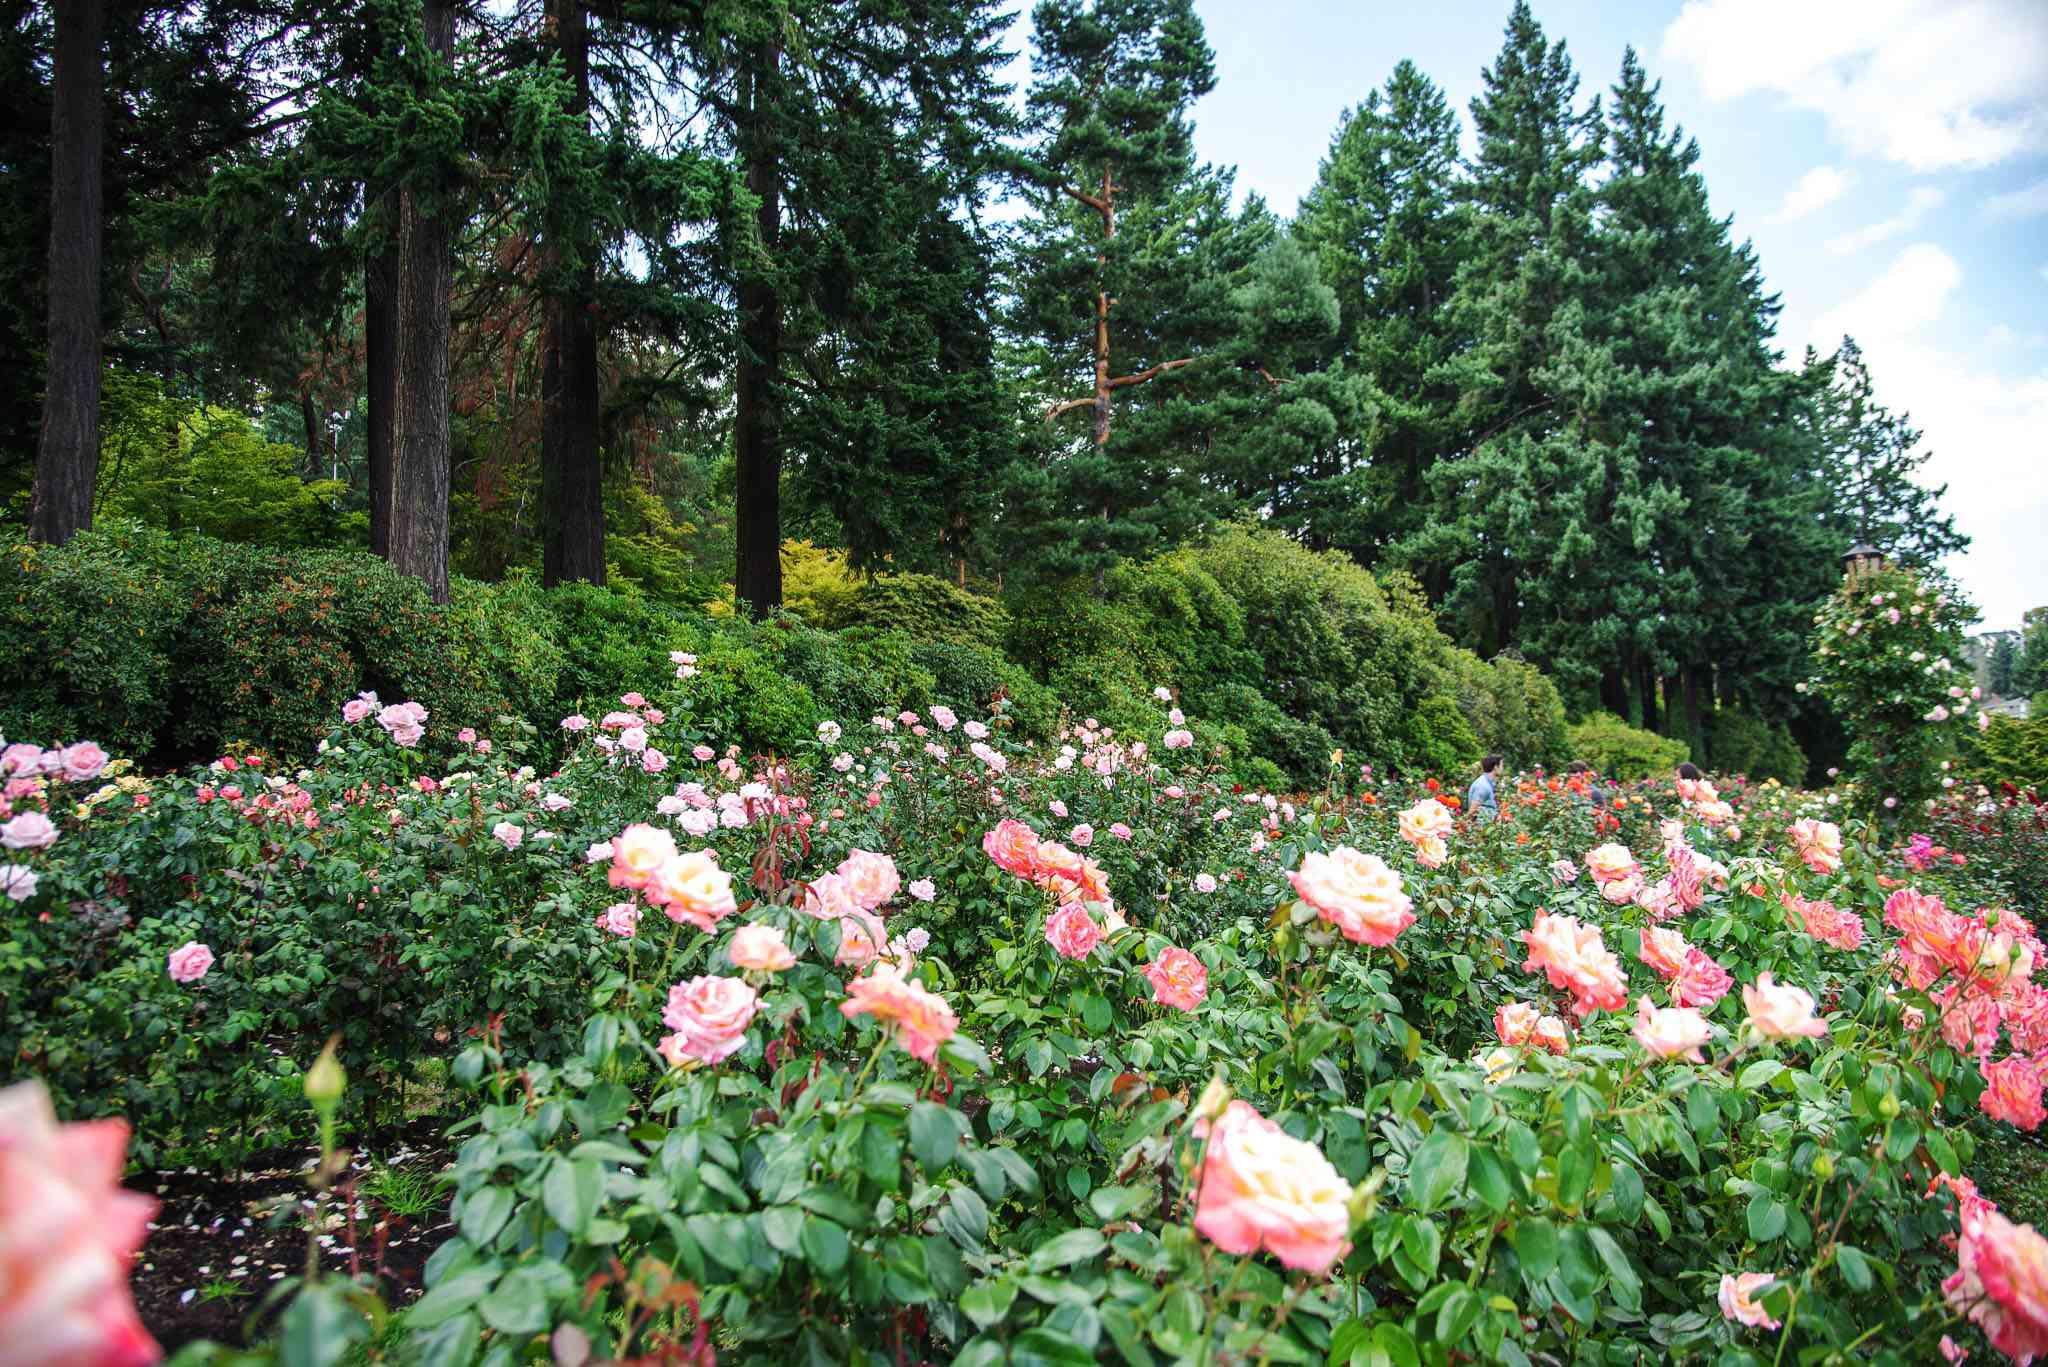 Un gran jardín de rosas rodeado de altos pinos verdes